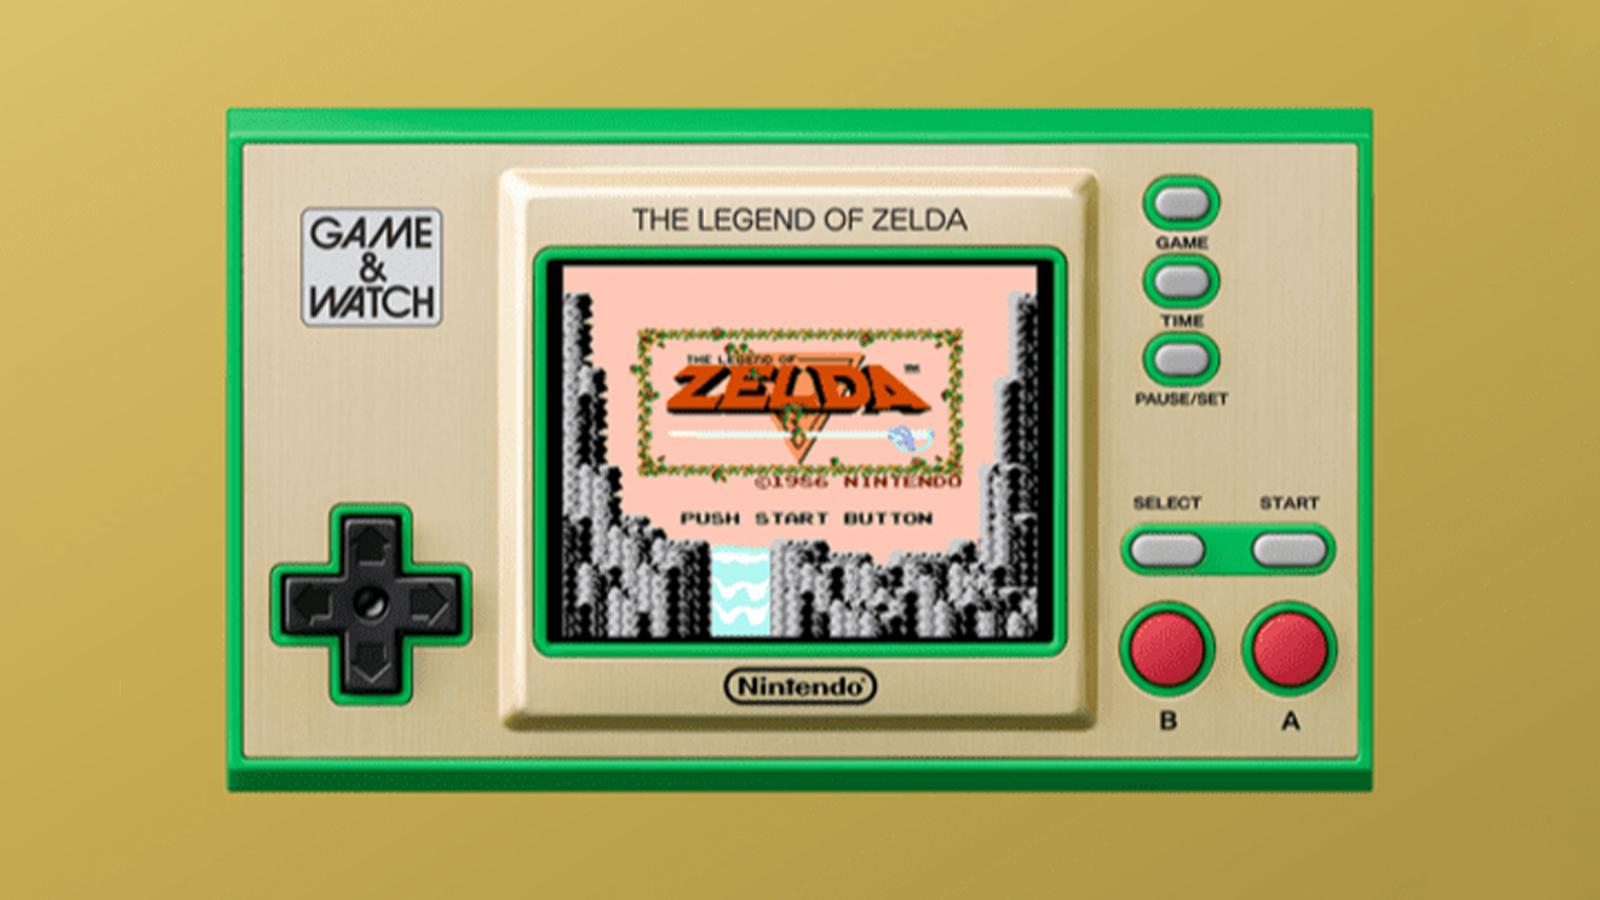 Nintendo Game & Watch: The Legend of Zelda System